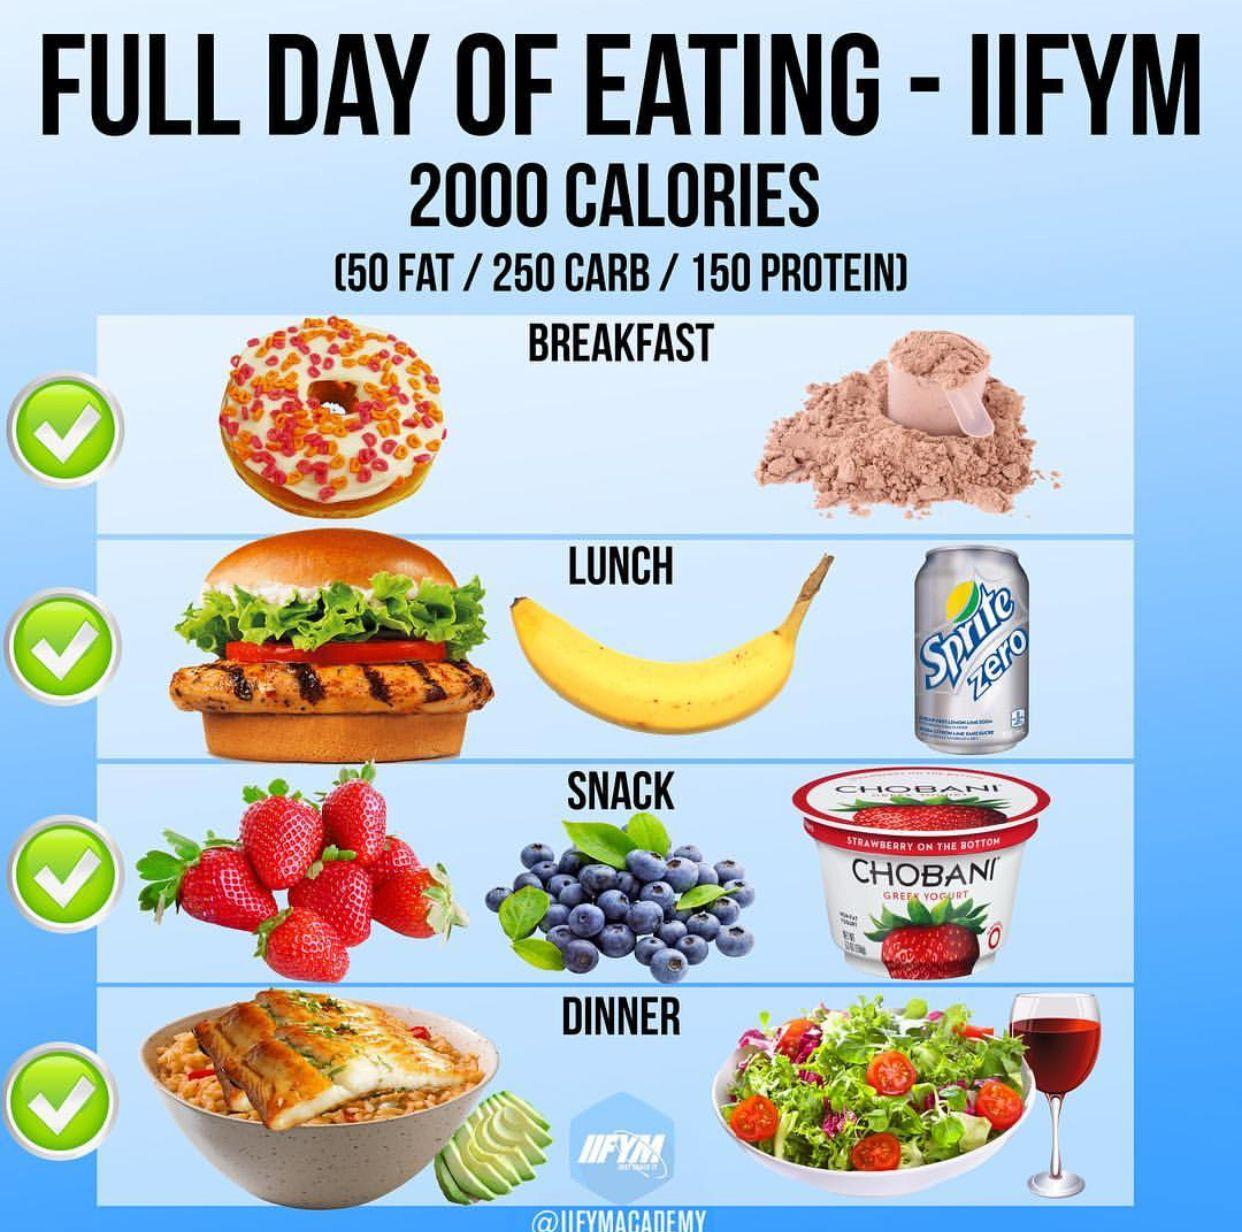 Workout Fitness Gym Bodybuilder Bodybuilding Delts Healthy Snacks Recipes Workout Food Food